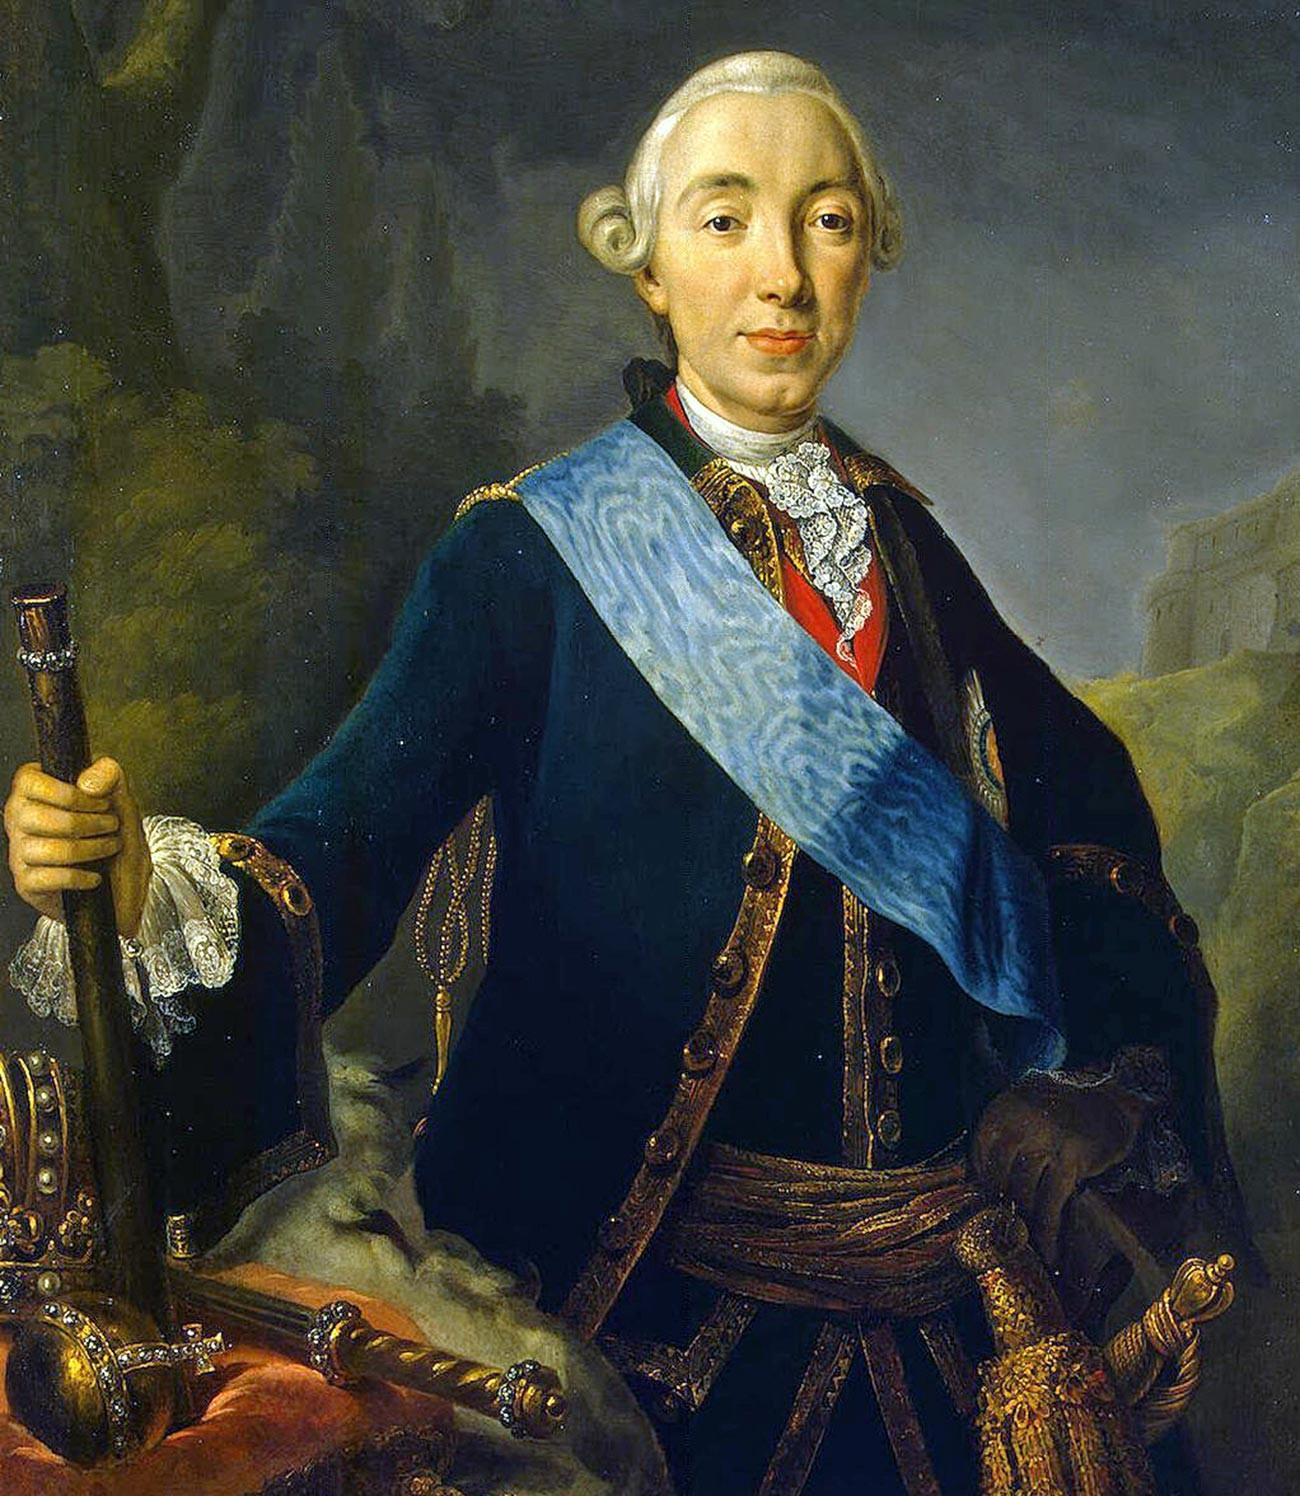 Portret cara Petra III. Fjodoroviča na dan njegove krunidbe.